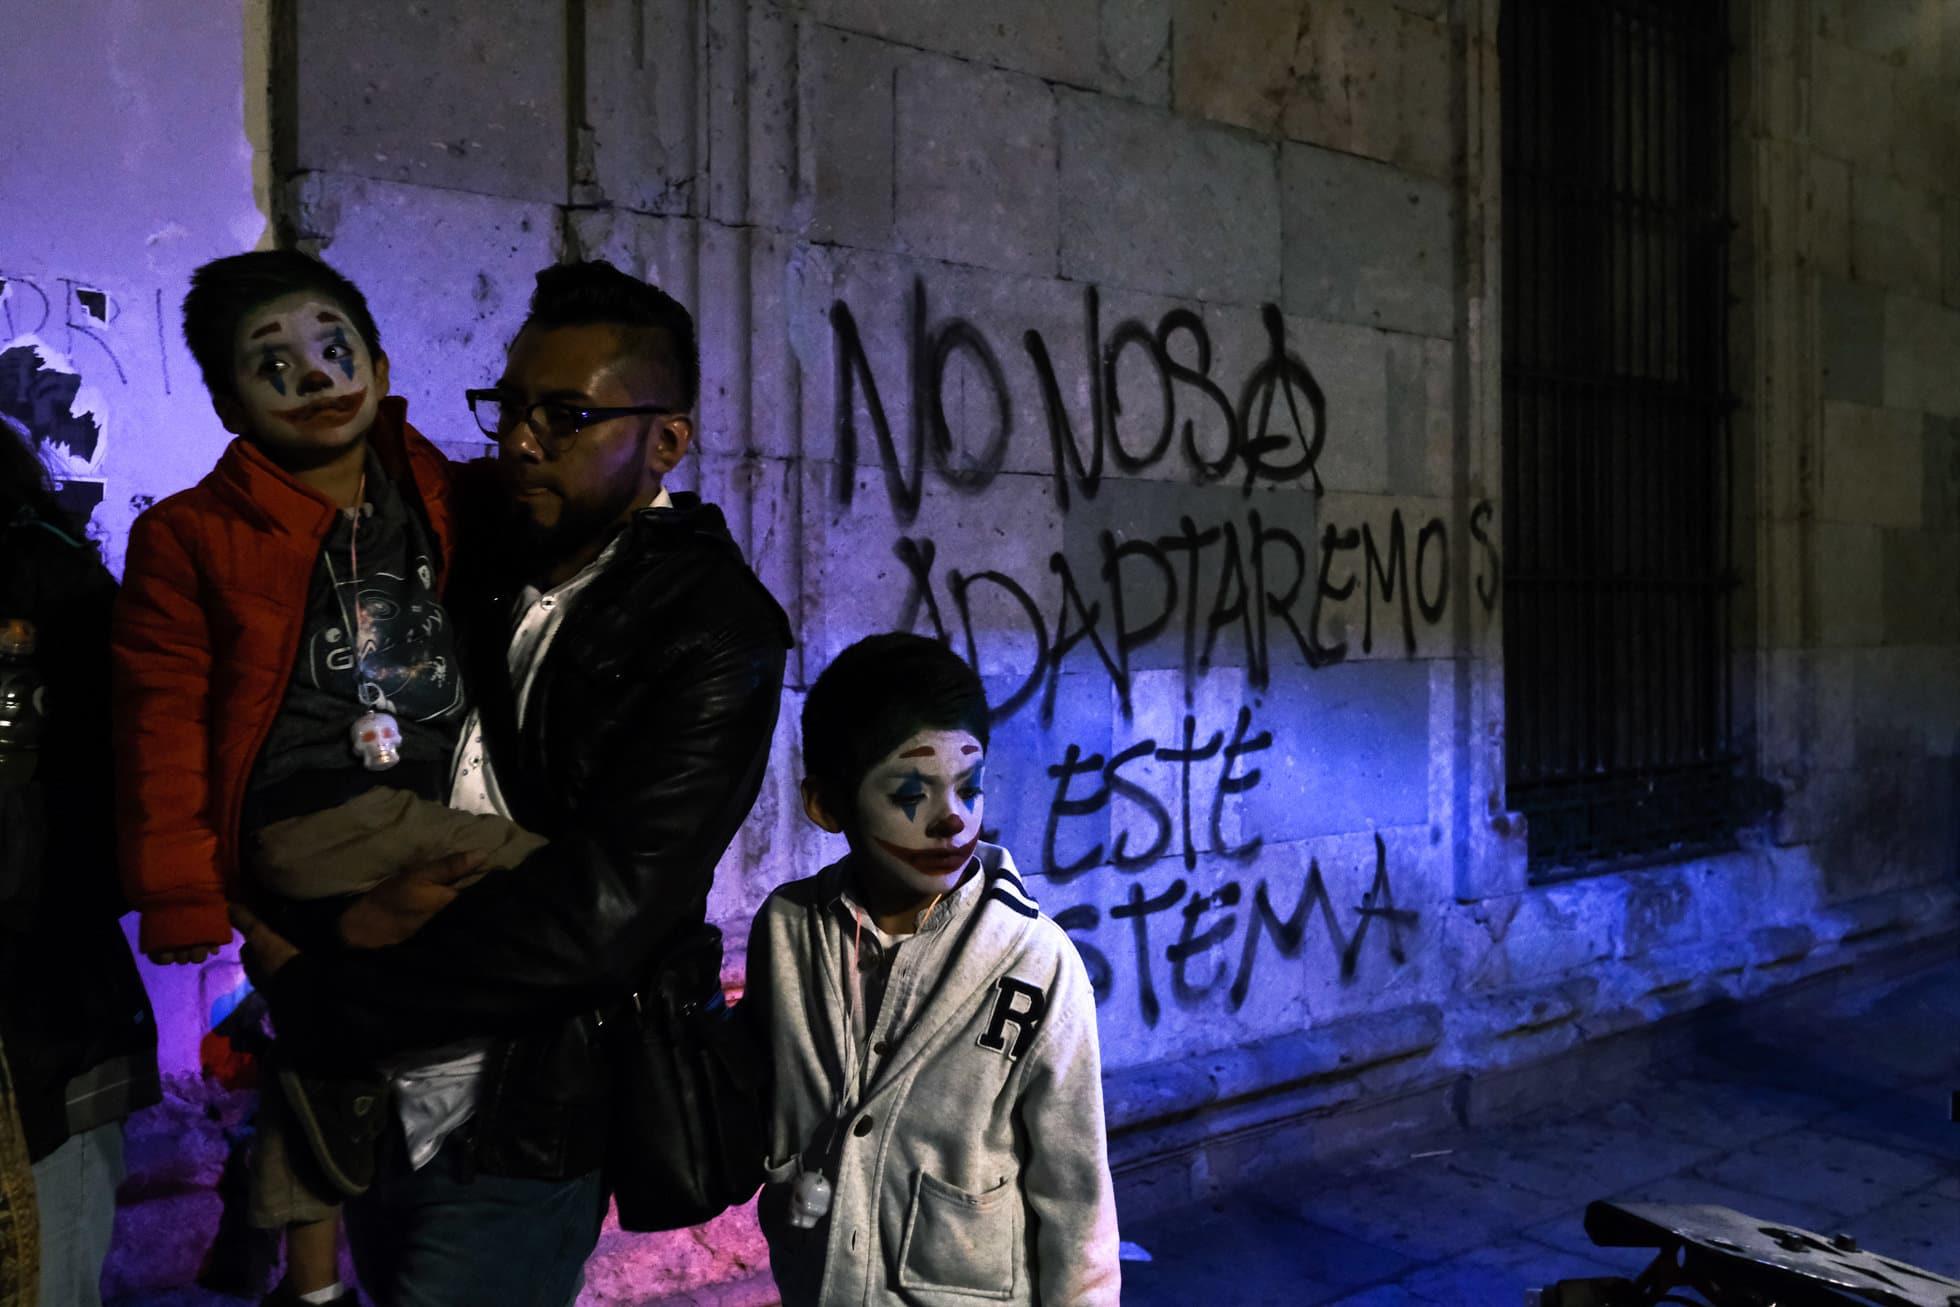 fujifilm-x-pro3-mexico-street-photography-30